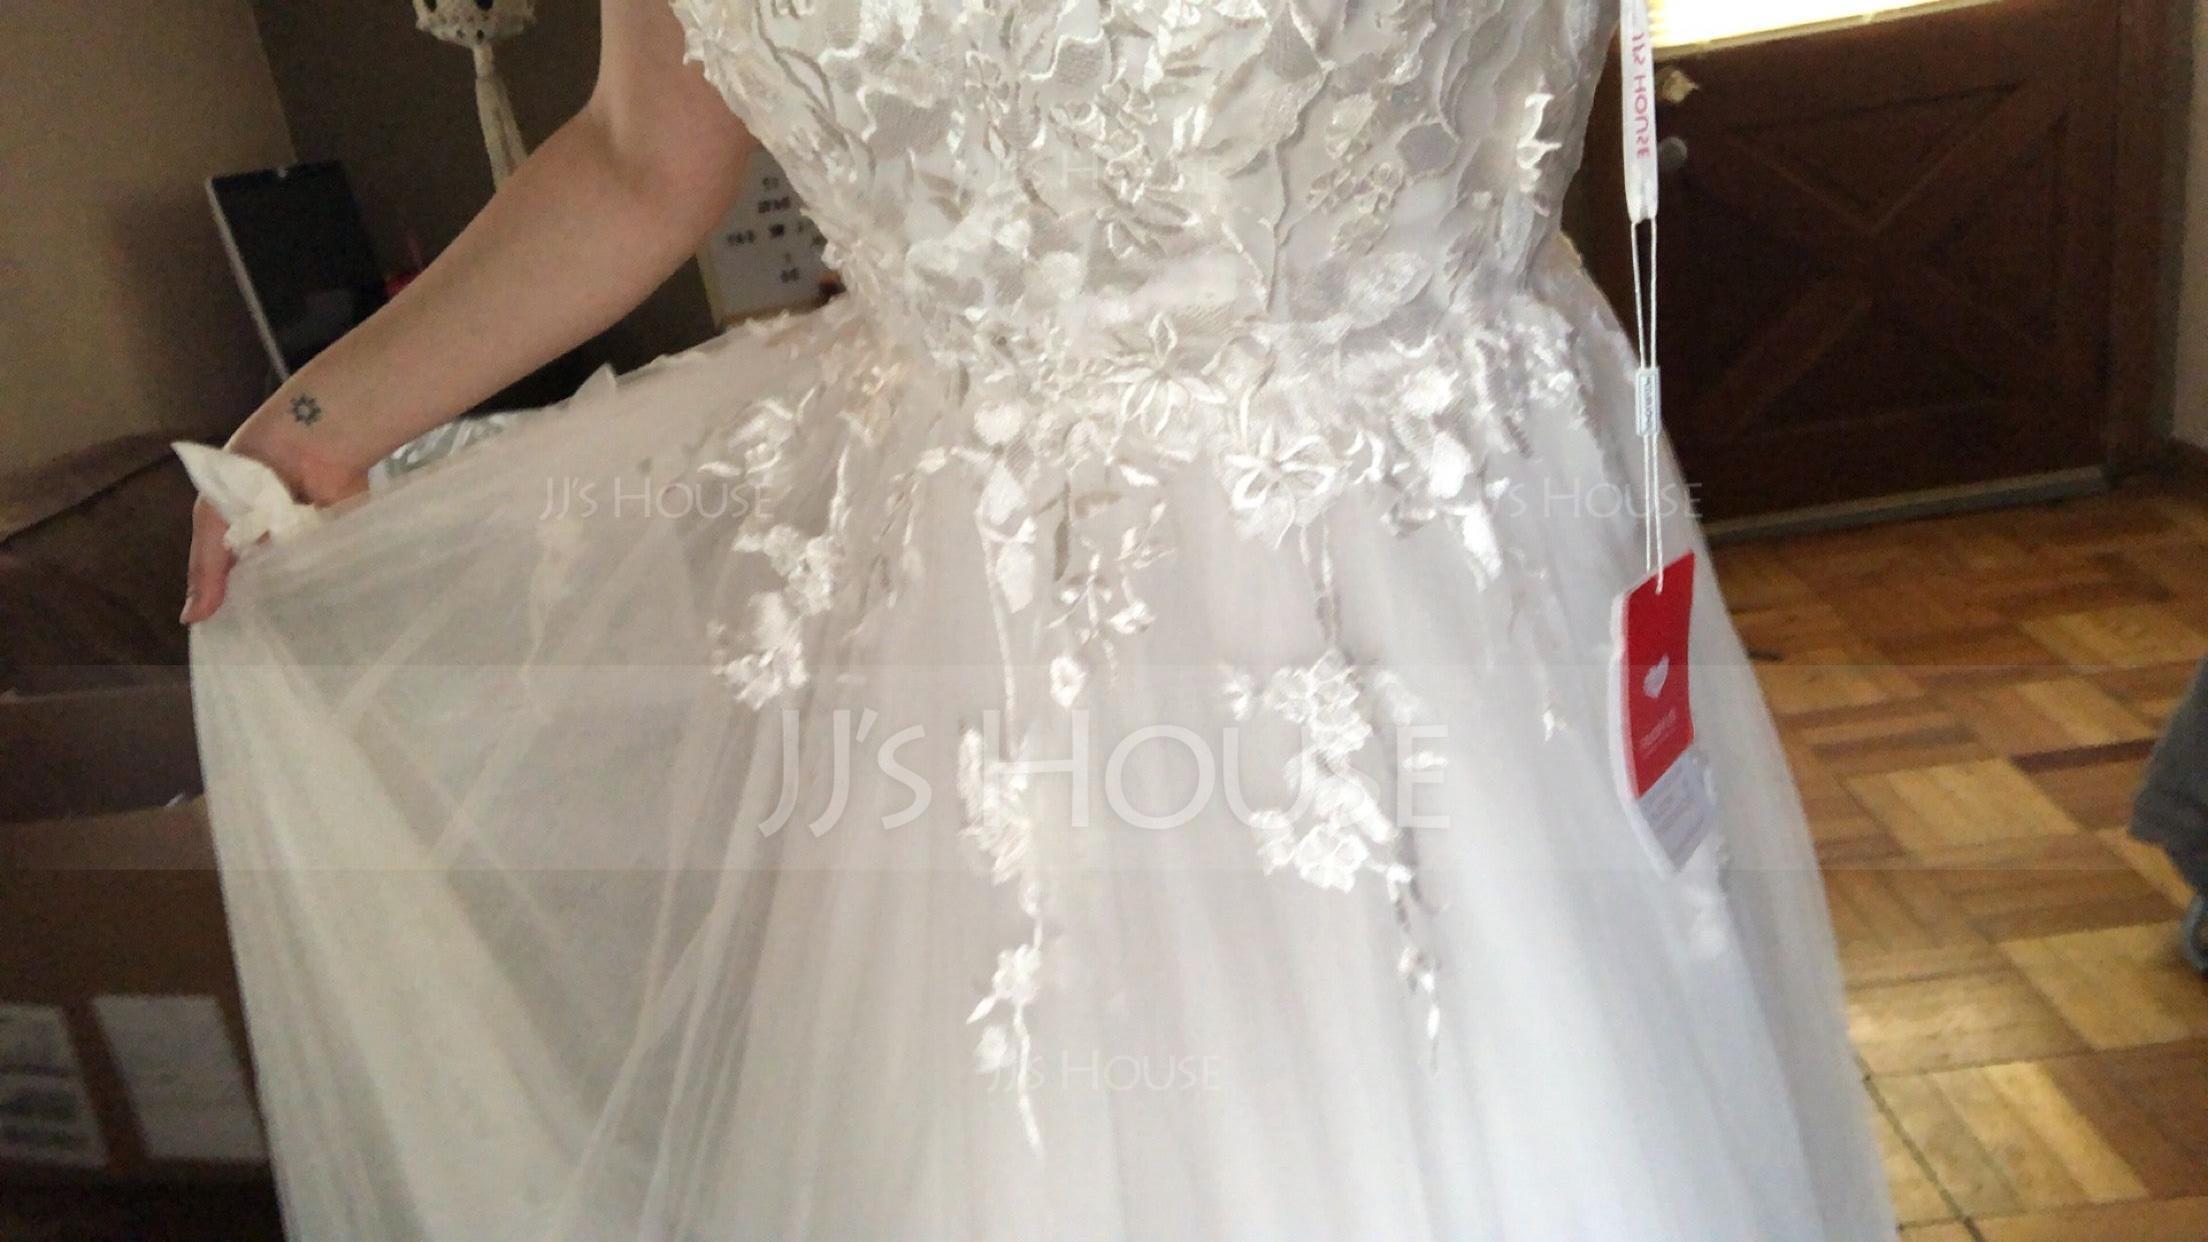 Robe Marquise Amoureux Balayage/Pinceau train Tulle Robe de mariée (002171937)